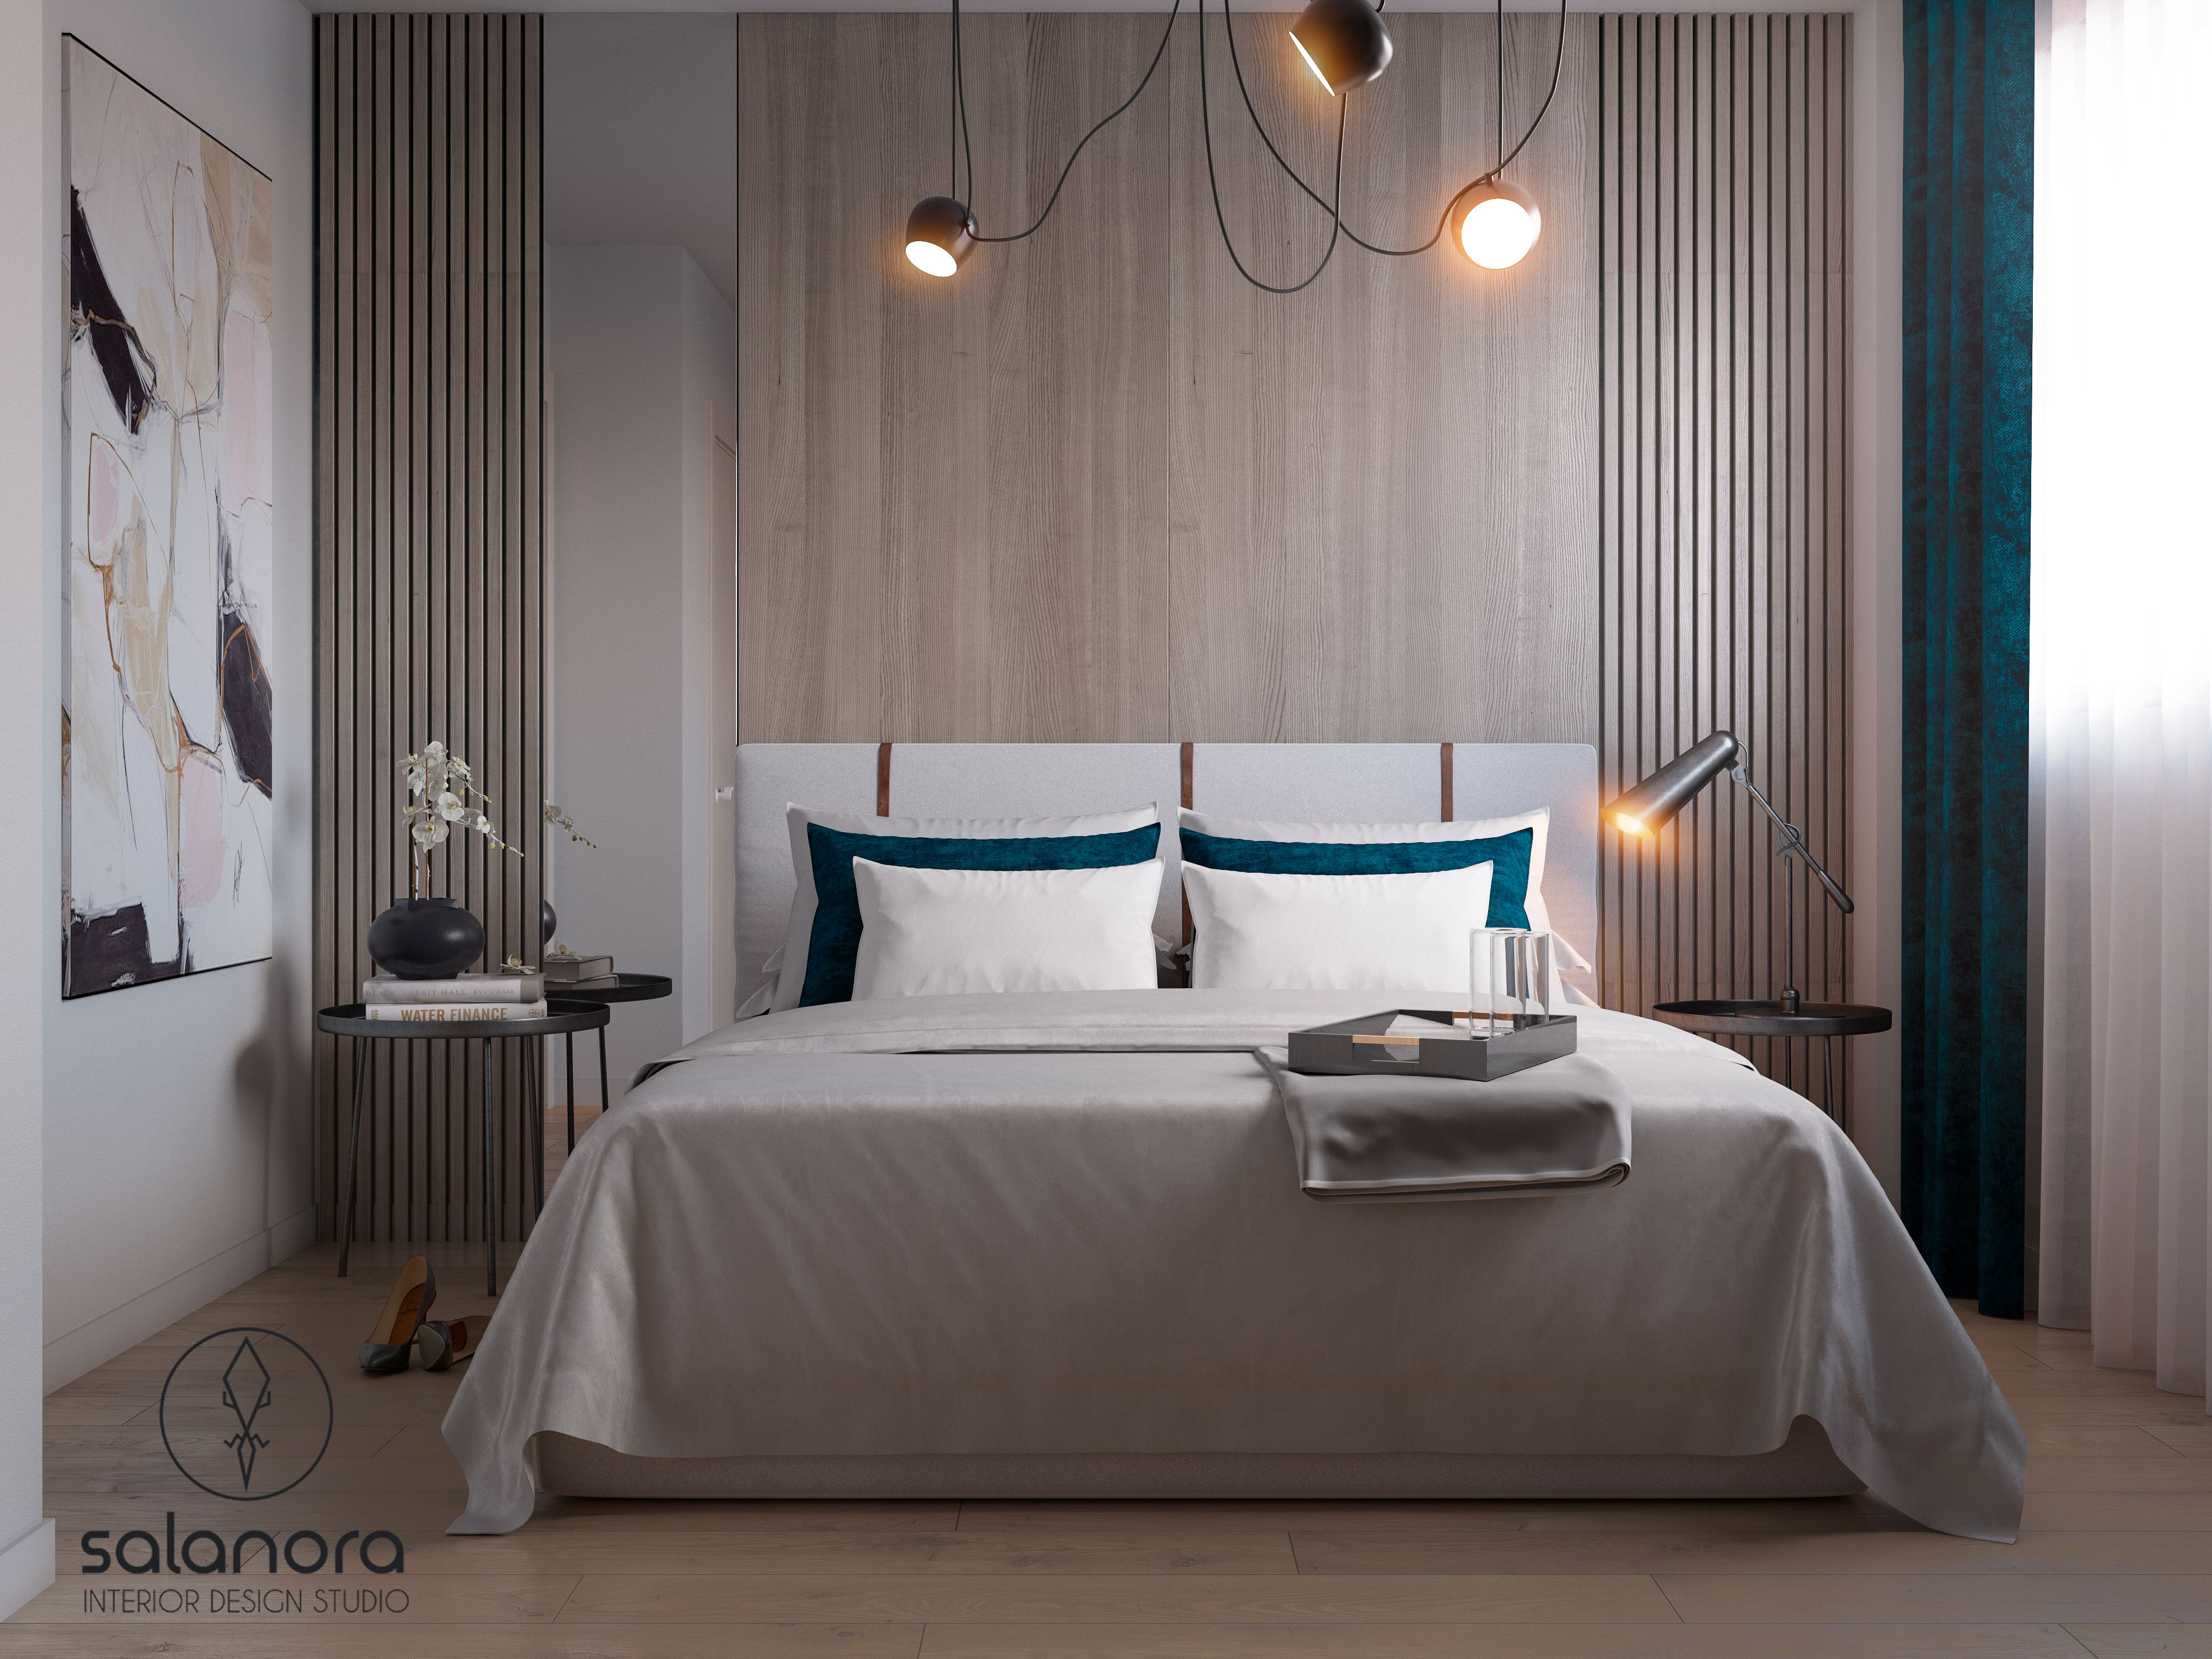 Salanora Interior Design Studio Scandinavian Style Master Bedroom Design Interior Design Bedroom Scandinavian Style Interior Design Masters Interior design bedroom images